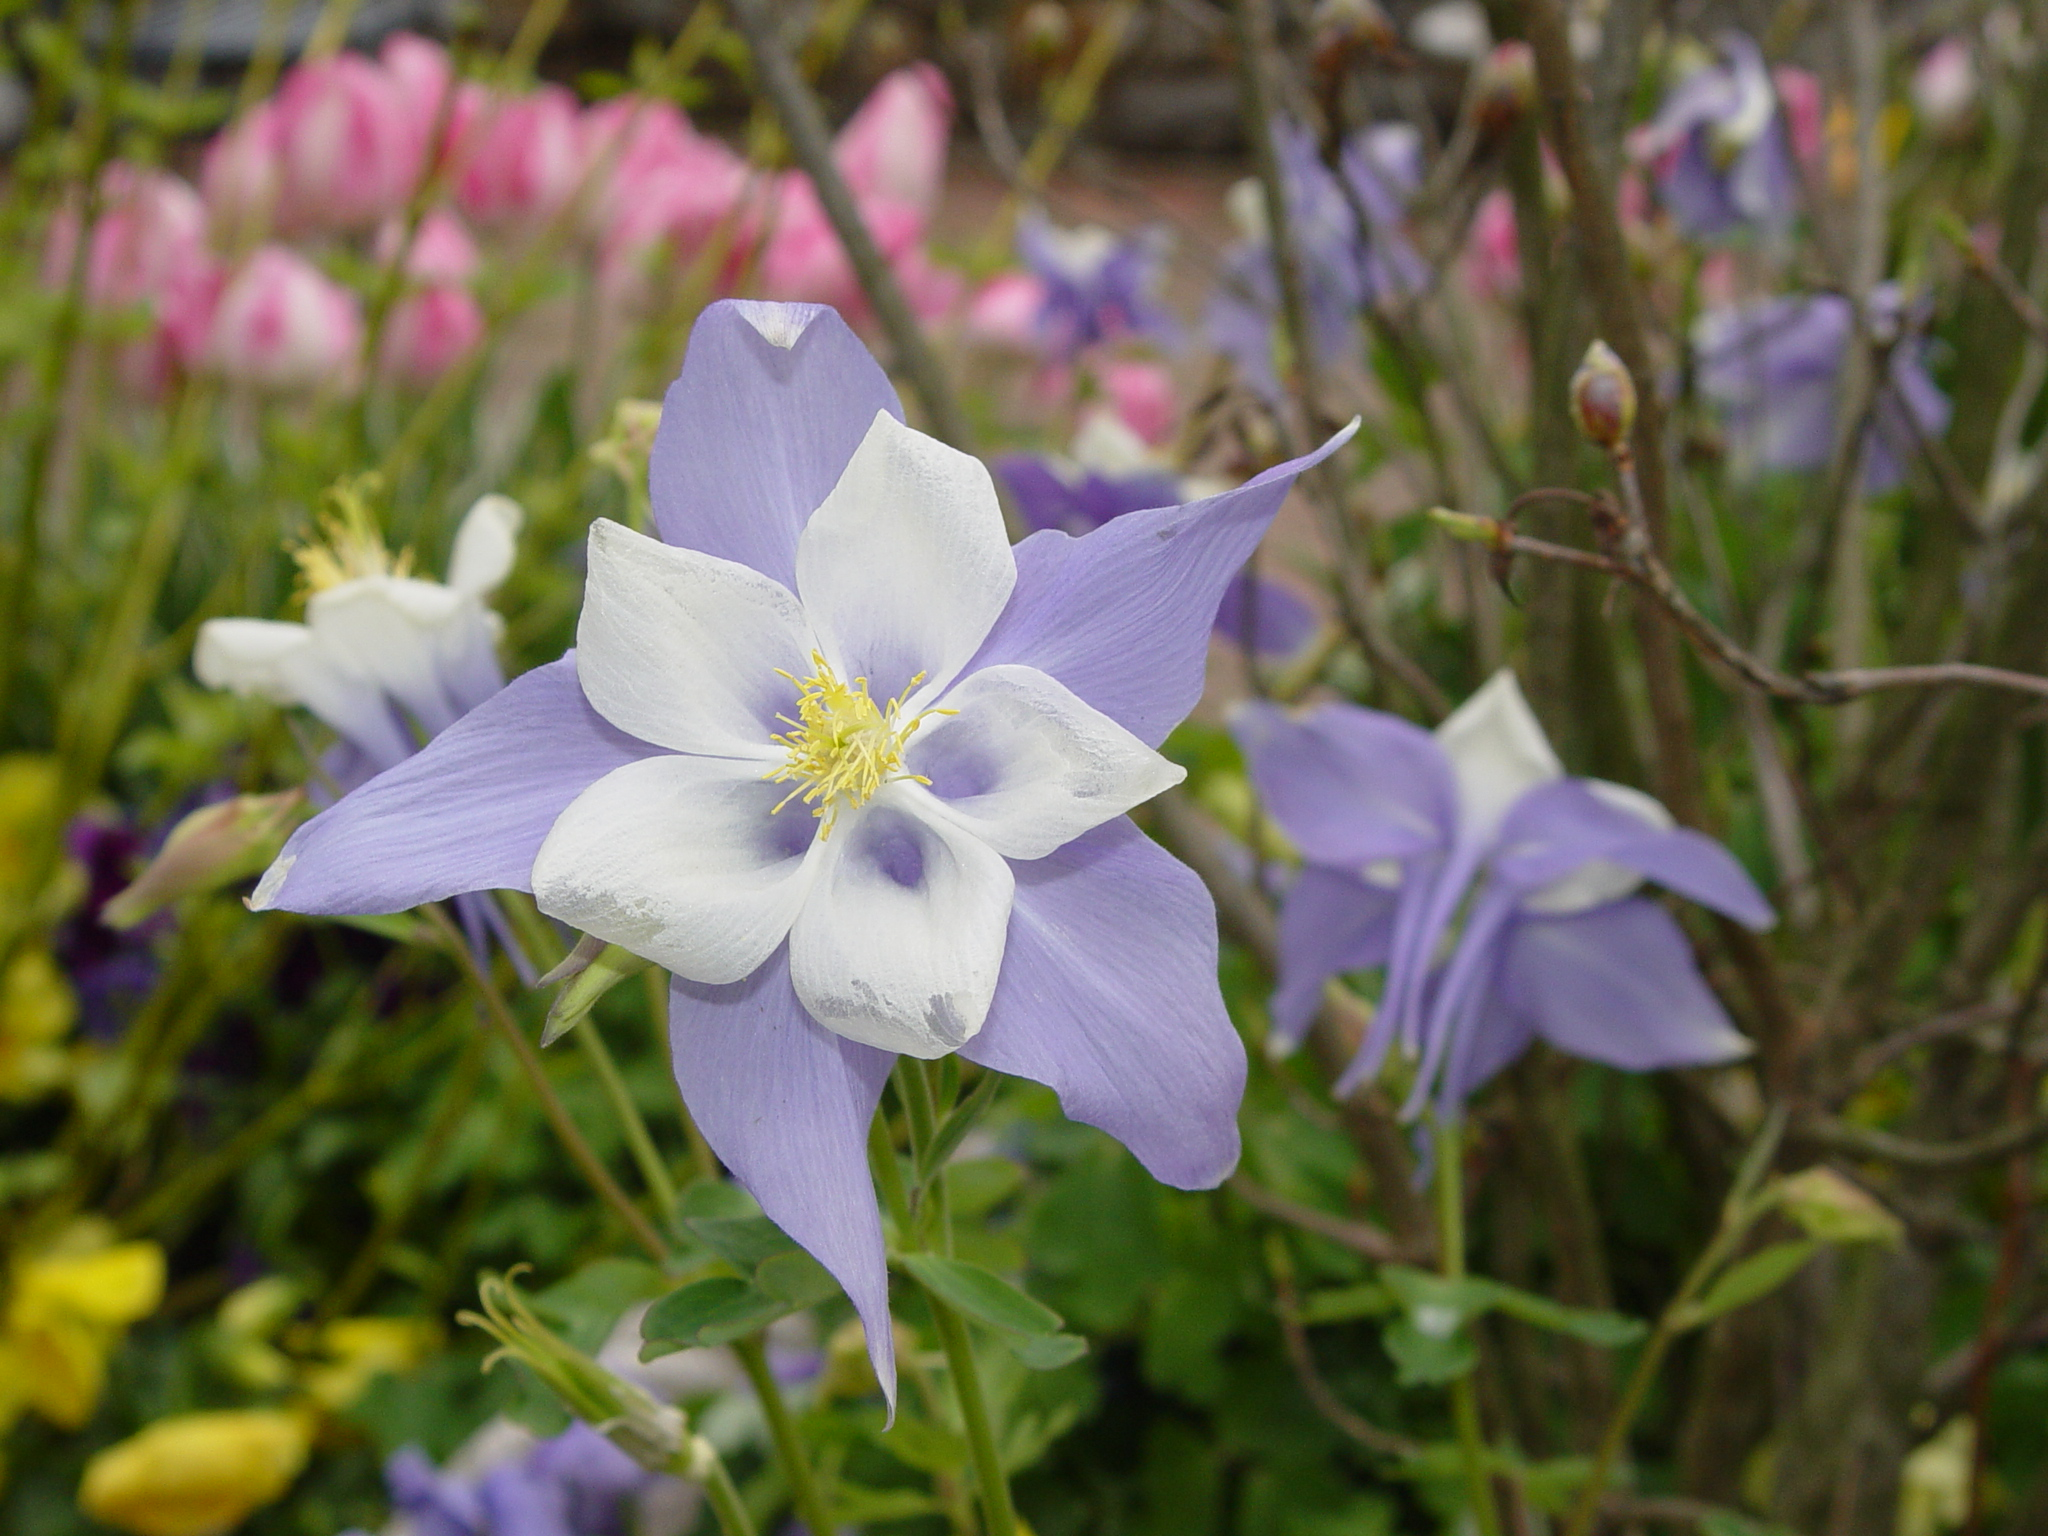 Colorado blue columbine aquilegia caerulea pics4learning colorado blue columbine aquilegia caerulea izmirmasajfo